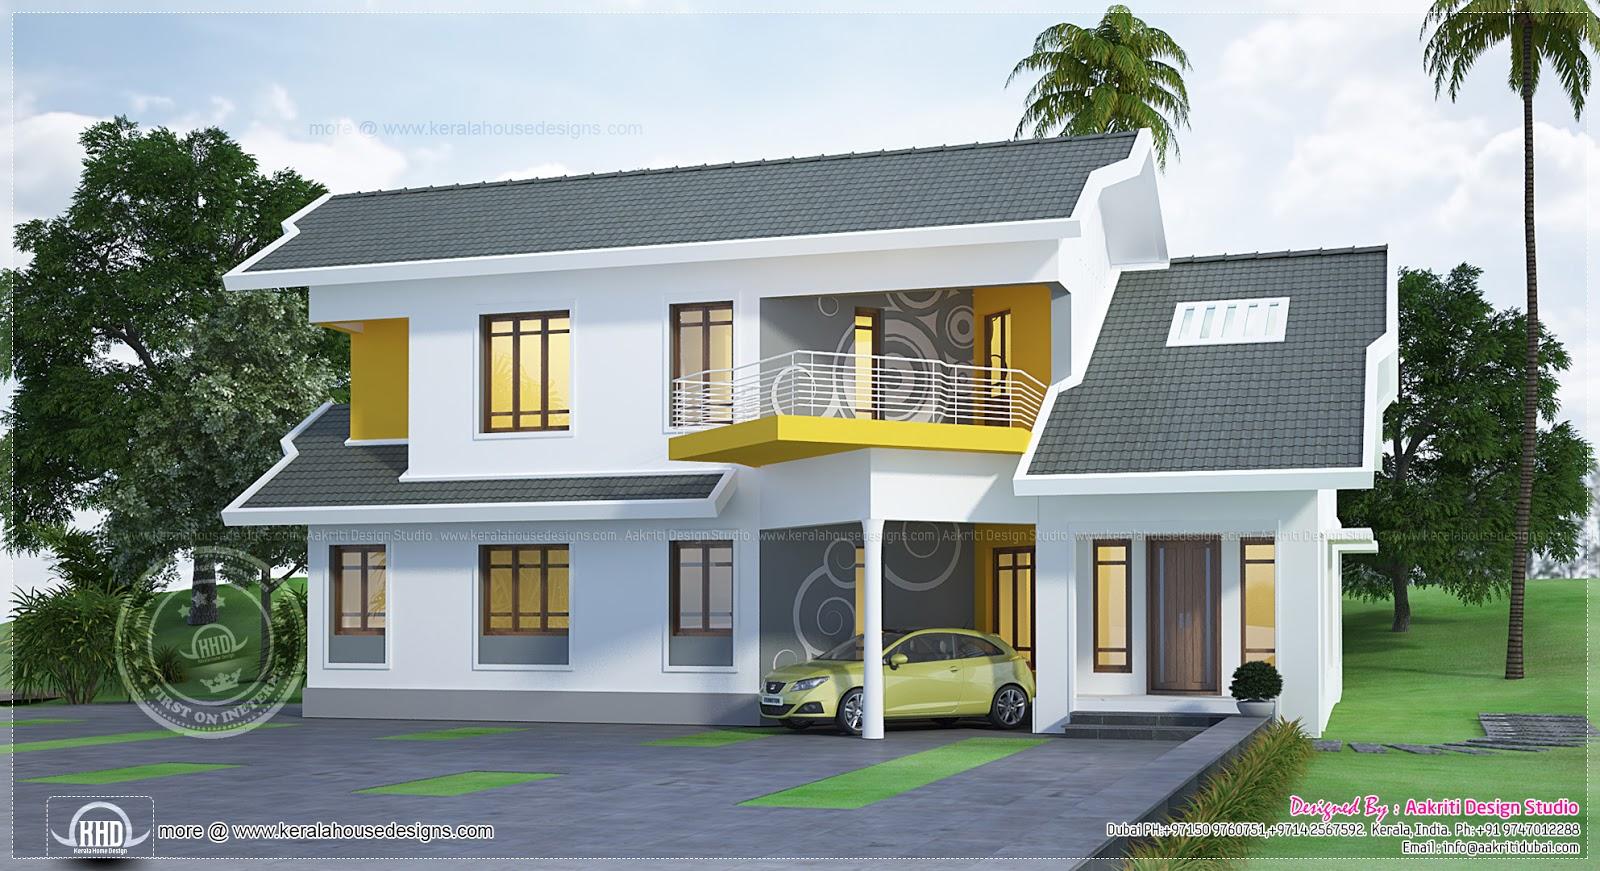 home modern house design modern house design cool house designs ventilated fresh plans freshnist